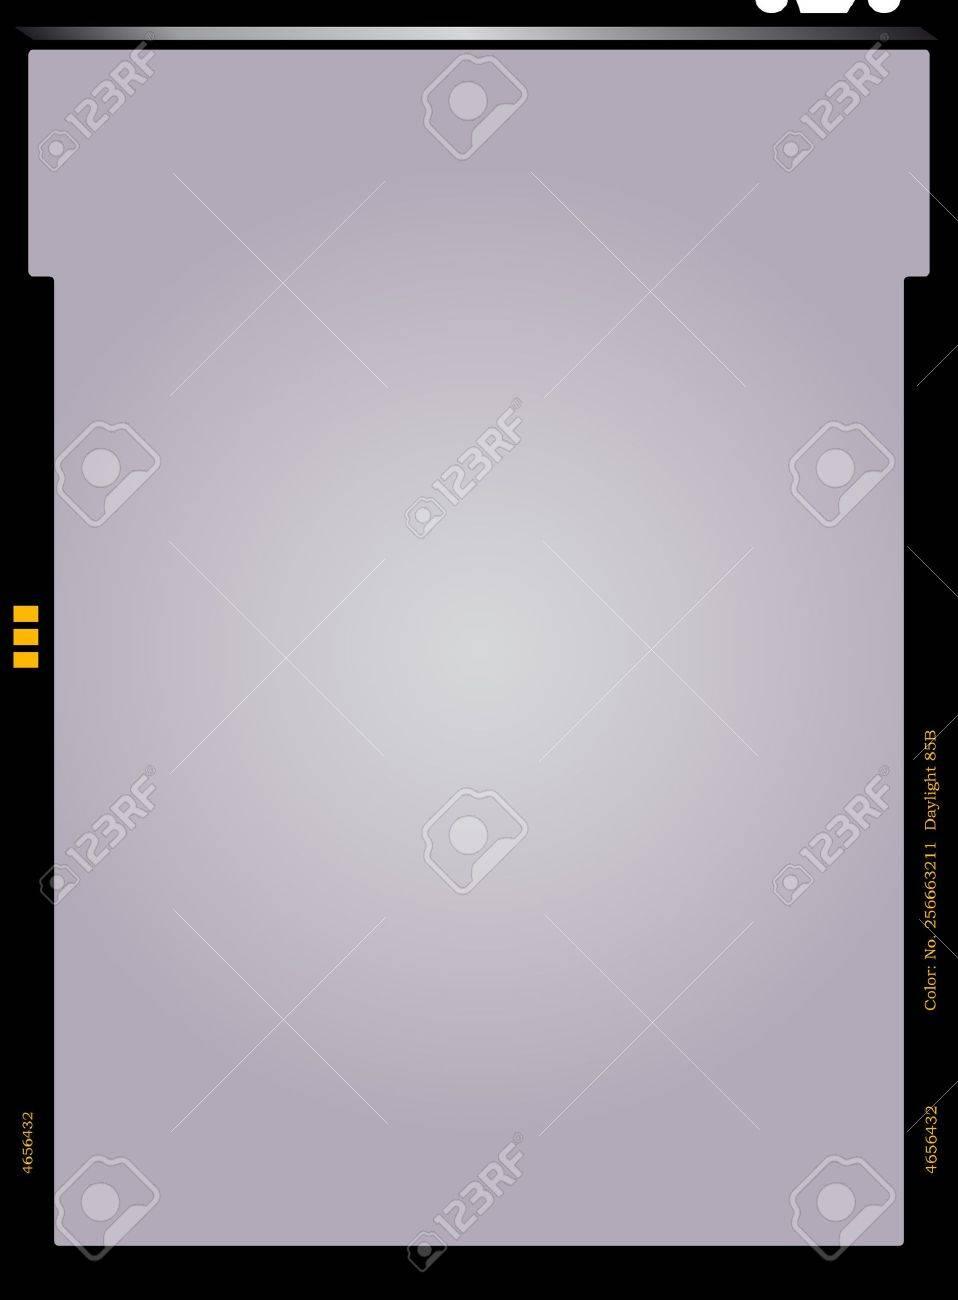 empty sheet film negative, picture frame, vector illustration - 24899818